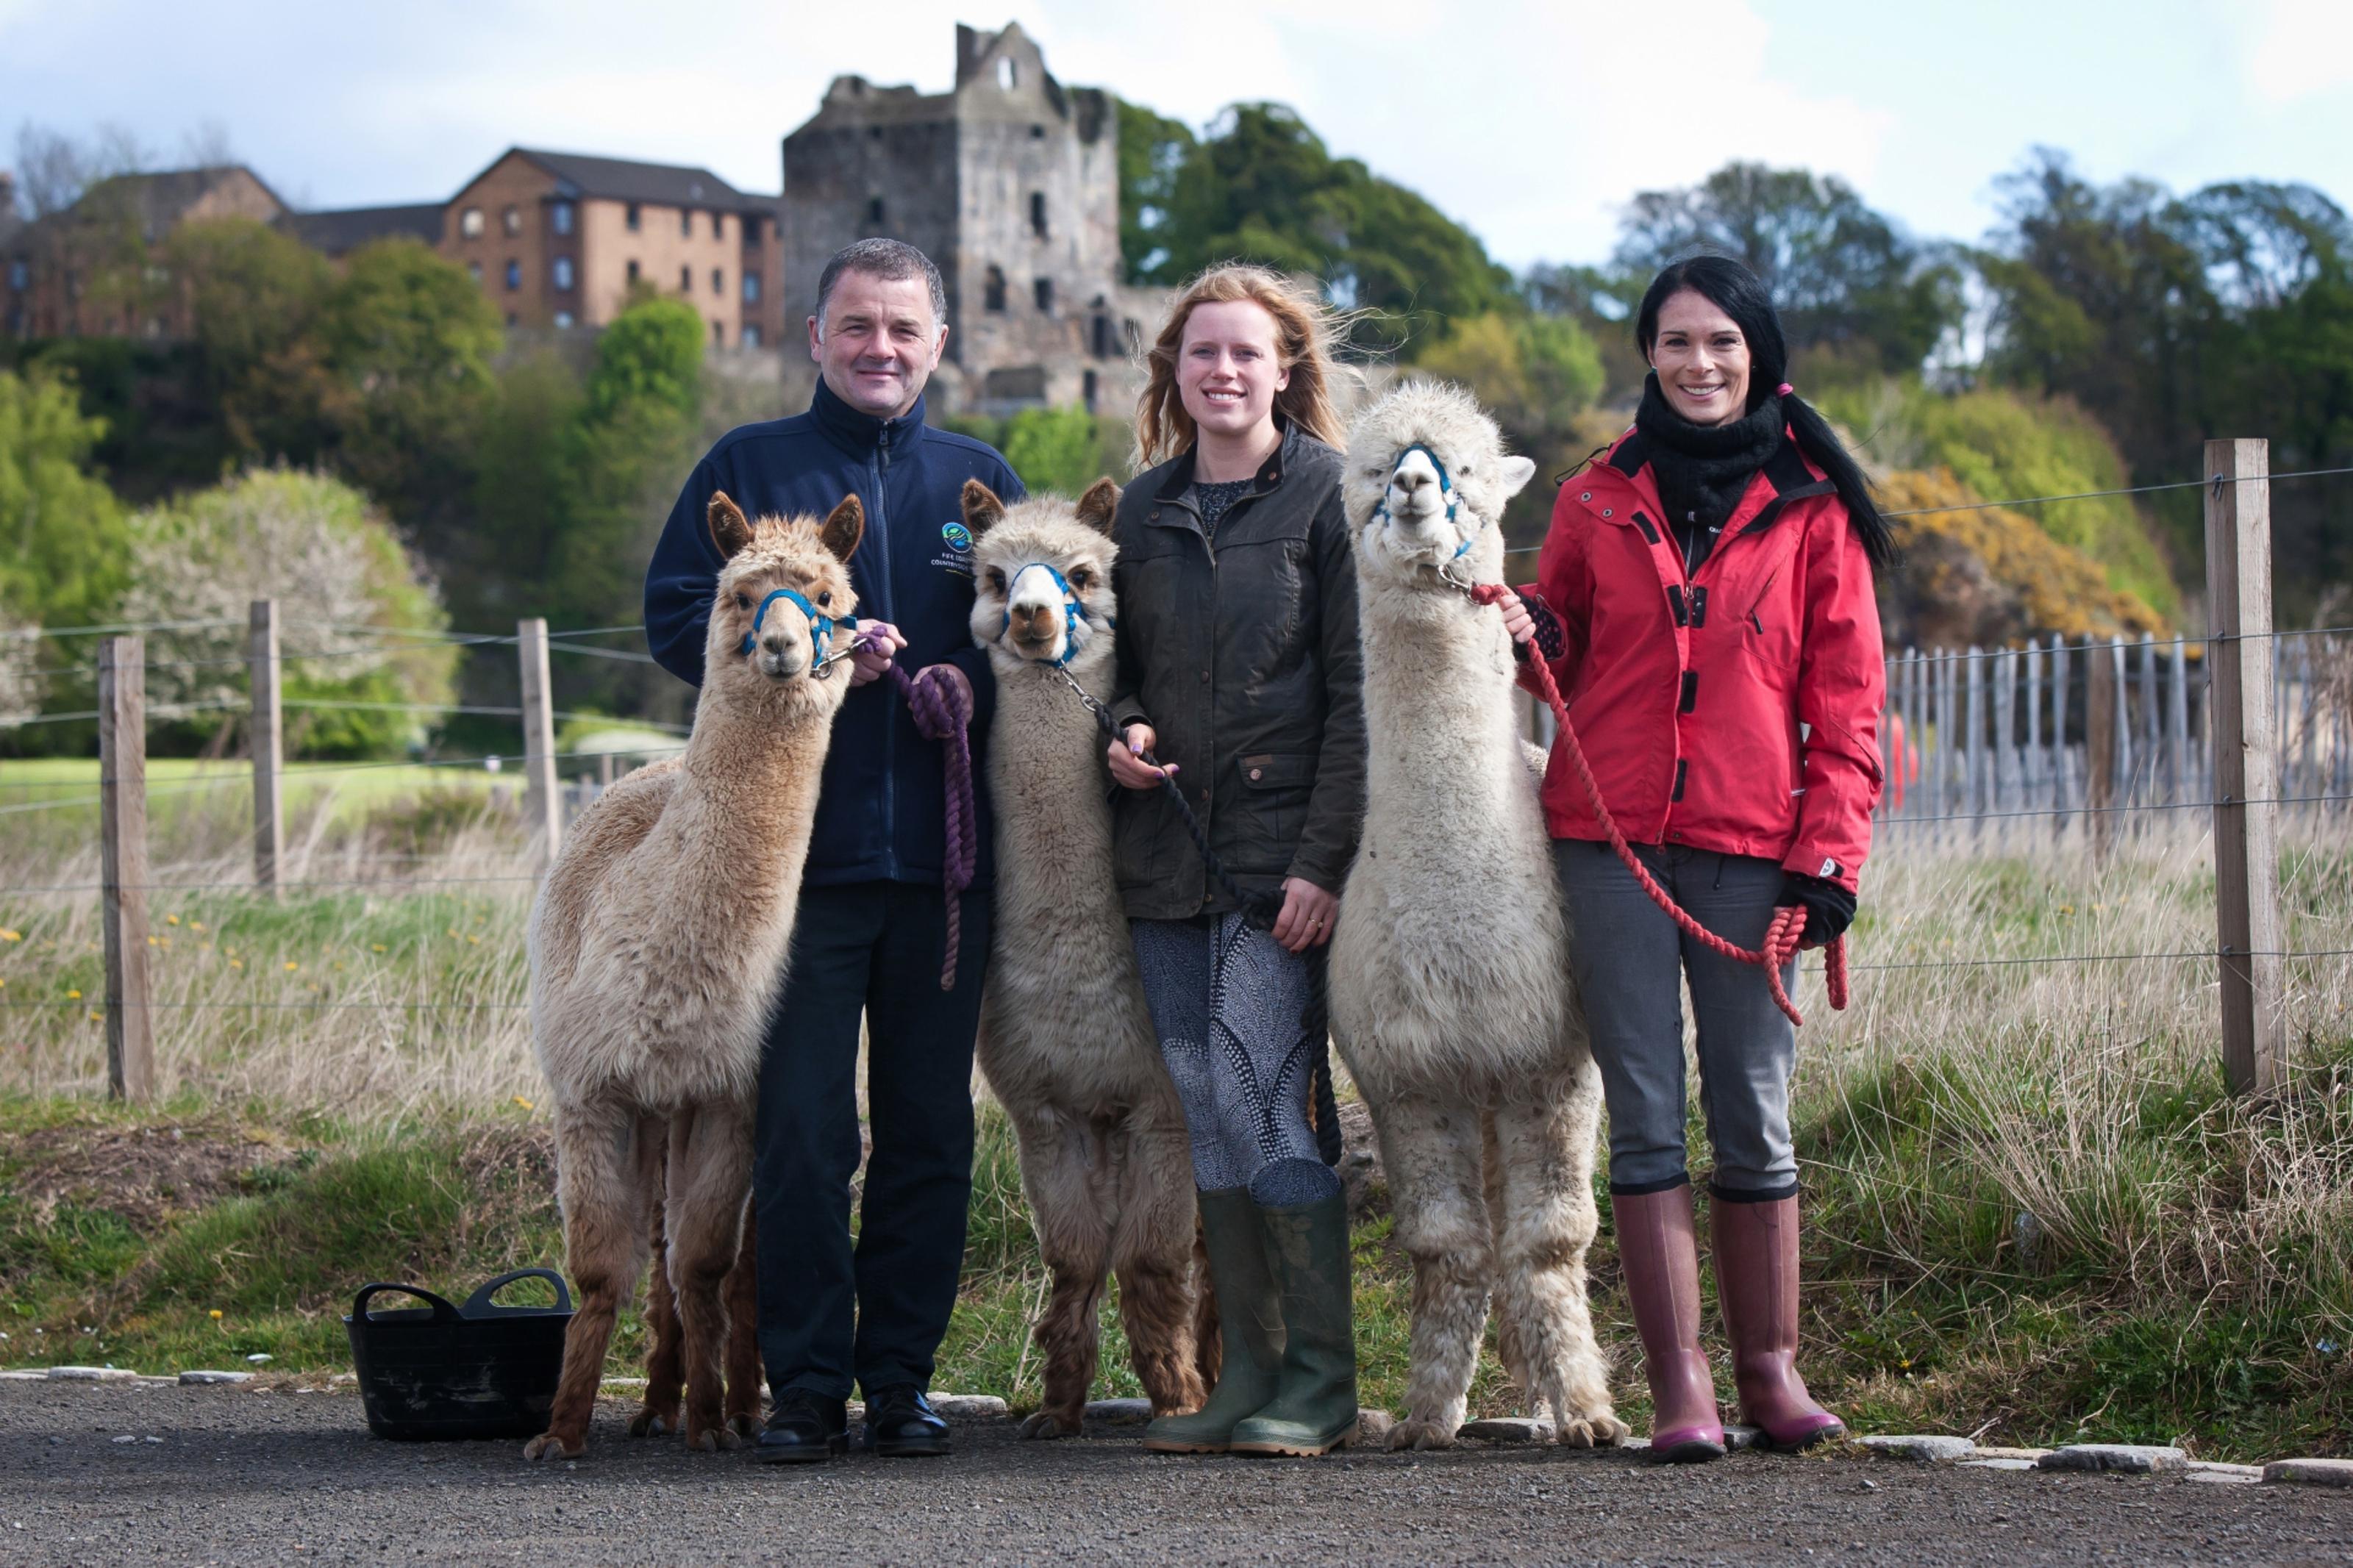 Gayle Ritchie meets Bowbridge alpacas on Kirkcaldy's Pathhead Sands. L-R: Robbie Blyth, coastal team leader of Fife Coast and Countryside Trust, Sarah Johnson, Gayle Ritchie and alpacas Balthazar, Lughaidh and Ajax.